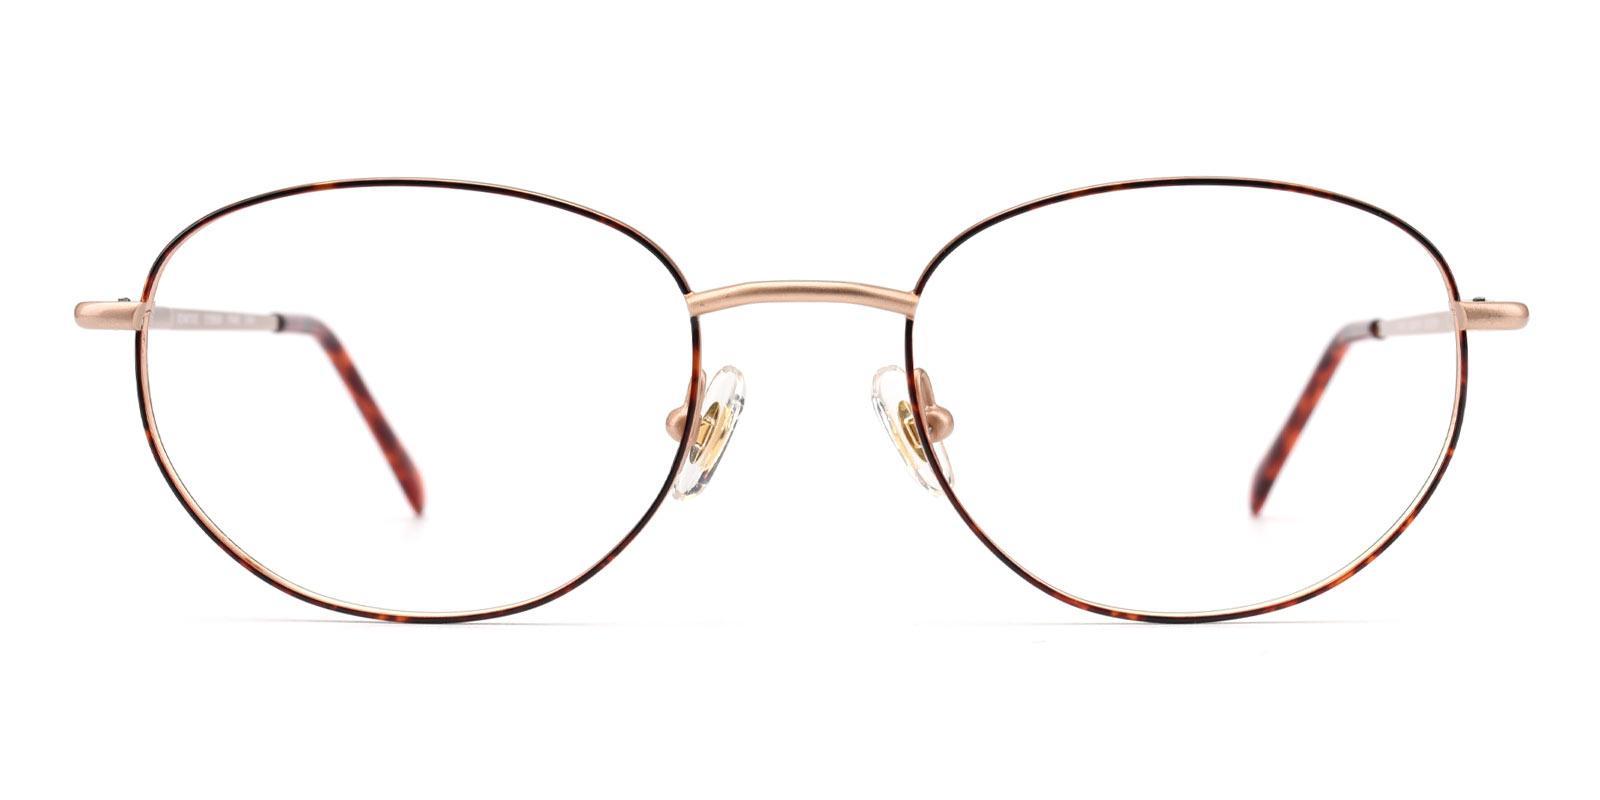 Quanna-Tortoise-Oval-Metal-Eyeglasses-detail